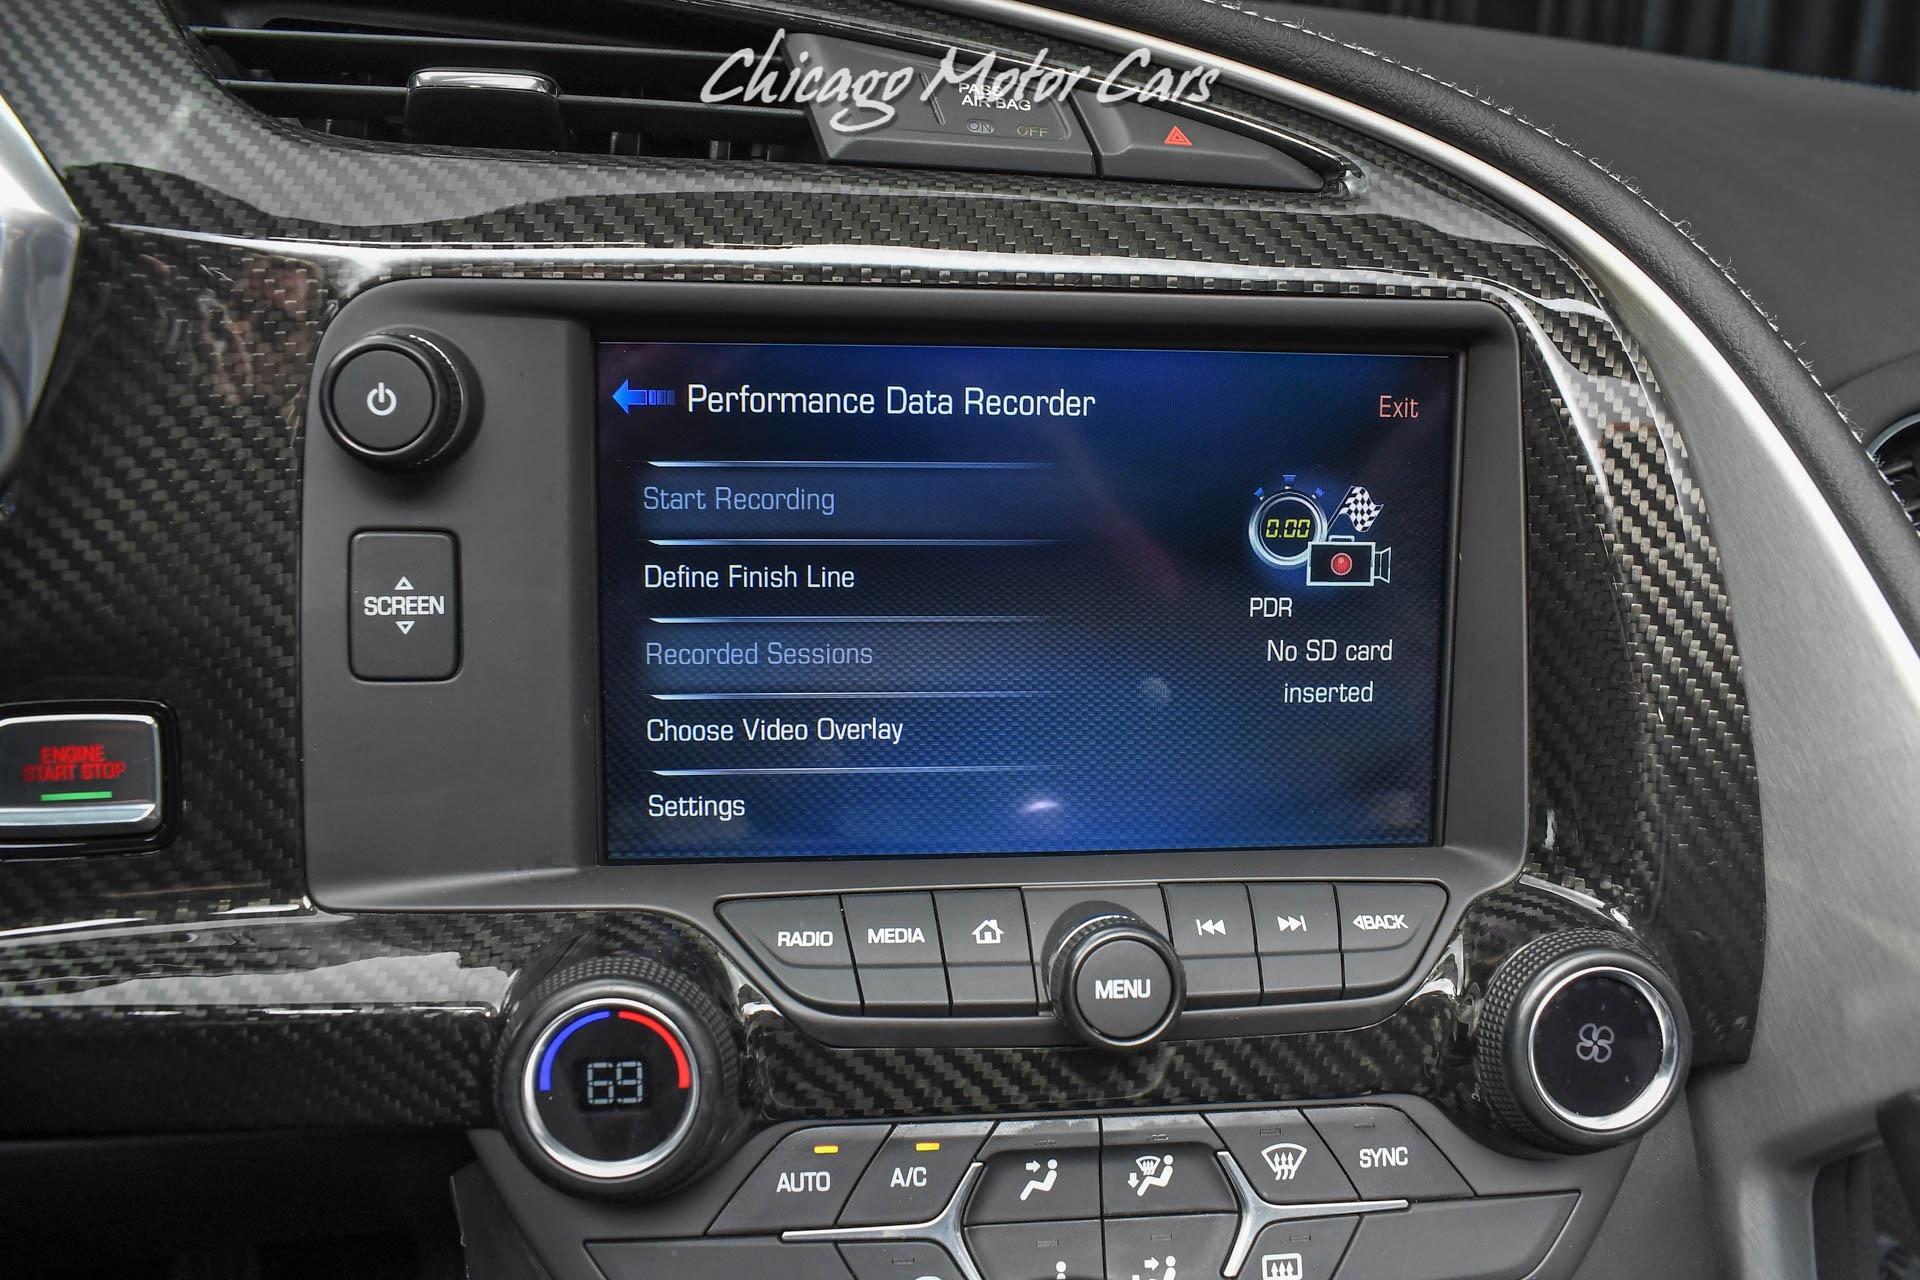 Used-2019-Chevrolet-Corvette-ZR1-Coupe-8-SPEED-Auto-Performance-Data-Recorder-Upgrades